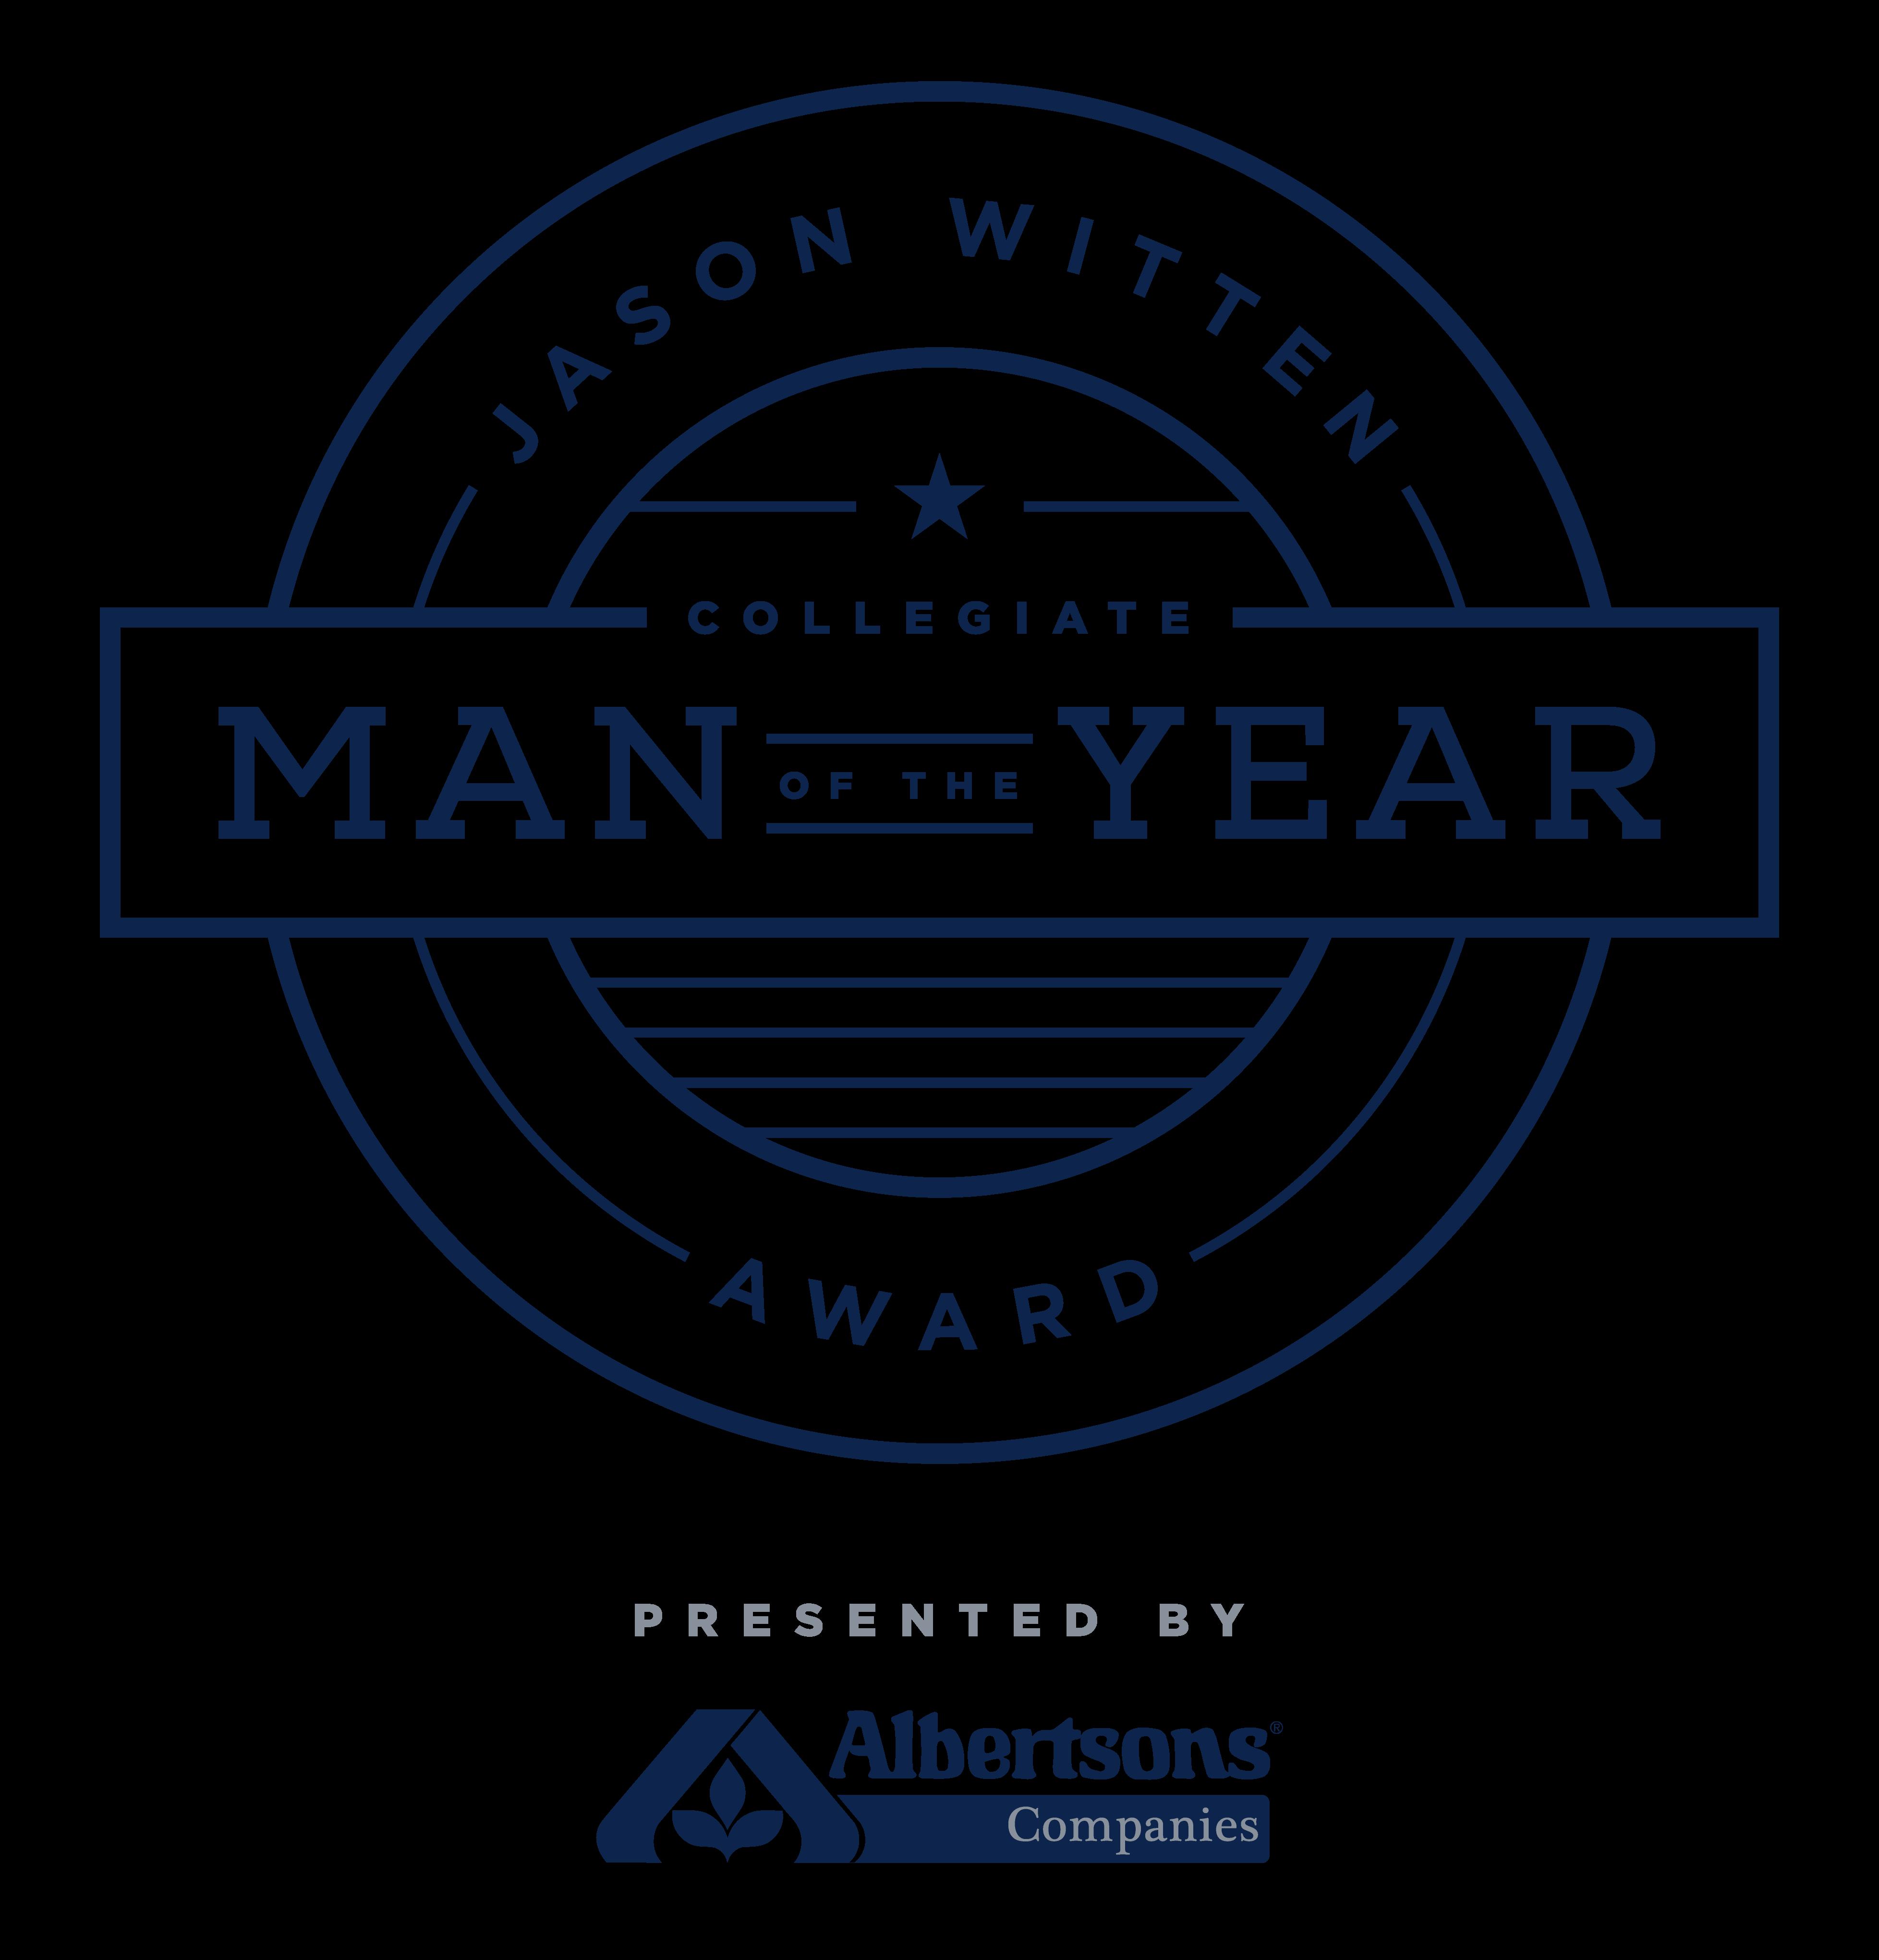 jason witten collegiate man of the year award jason witten 82